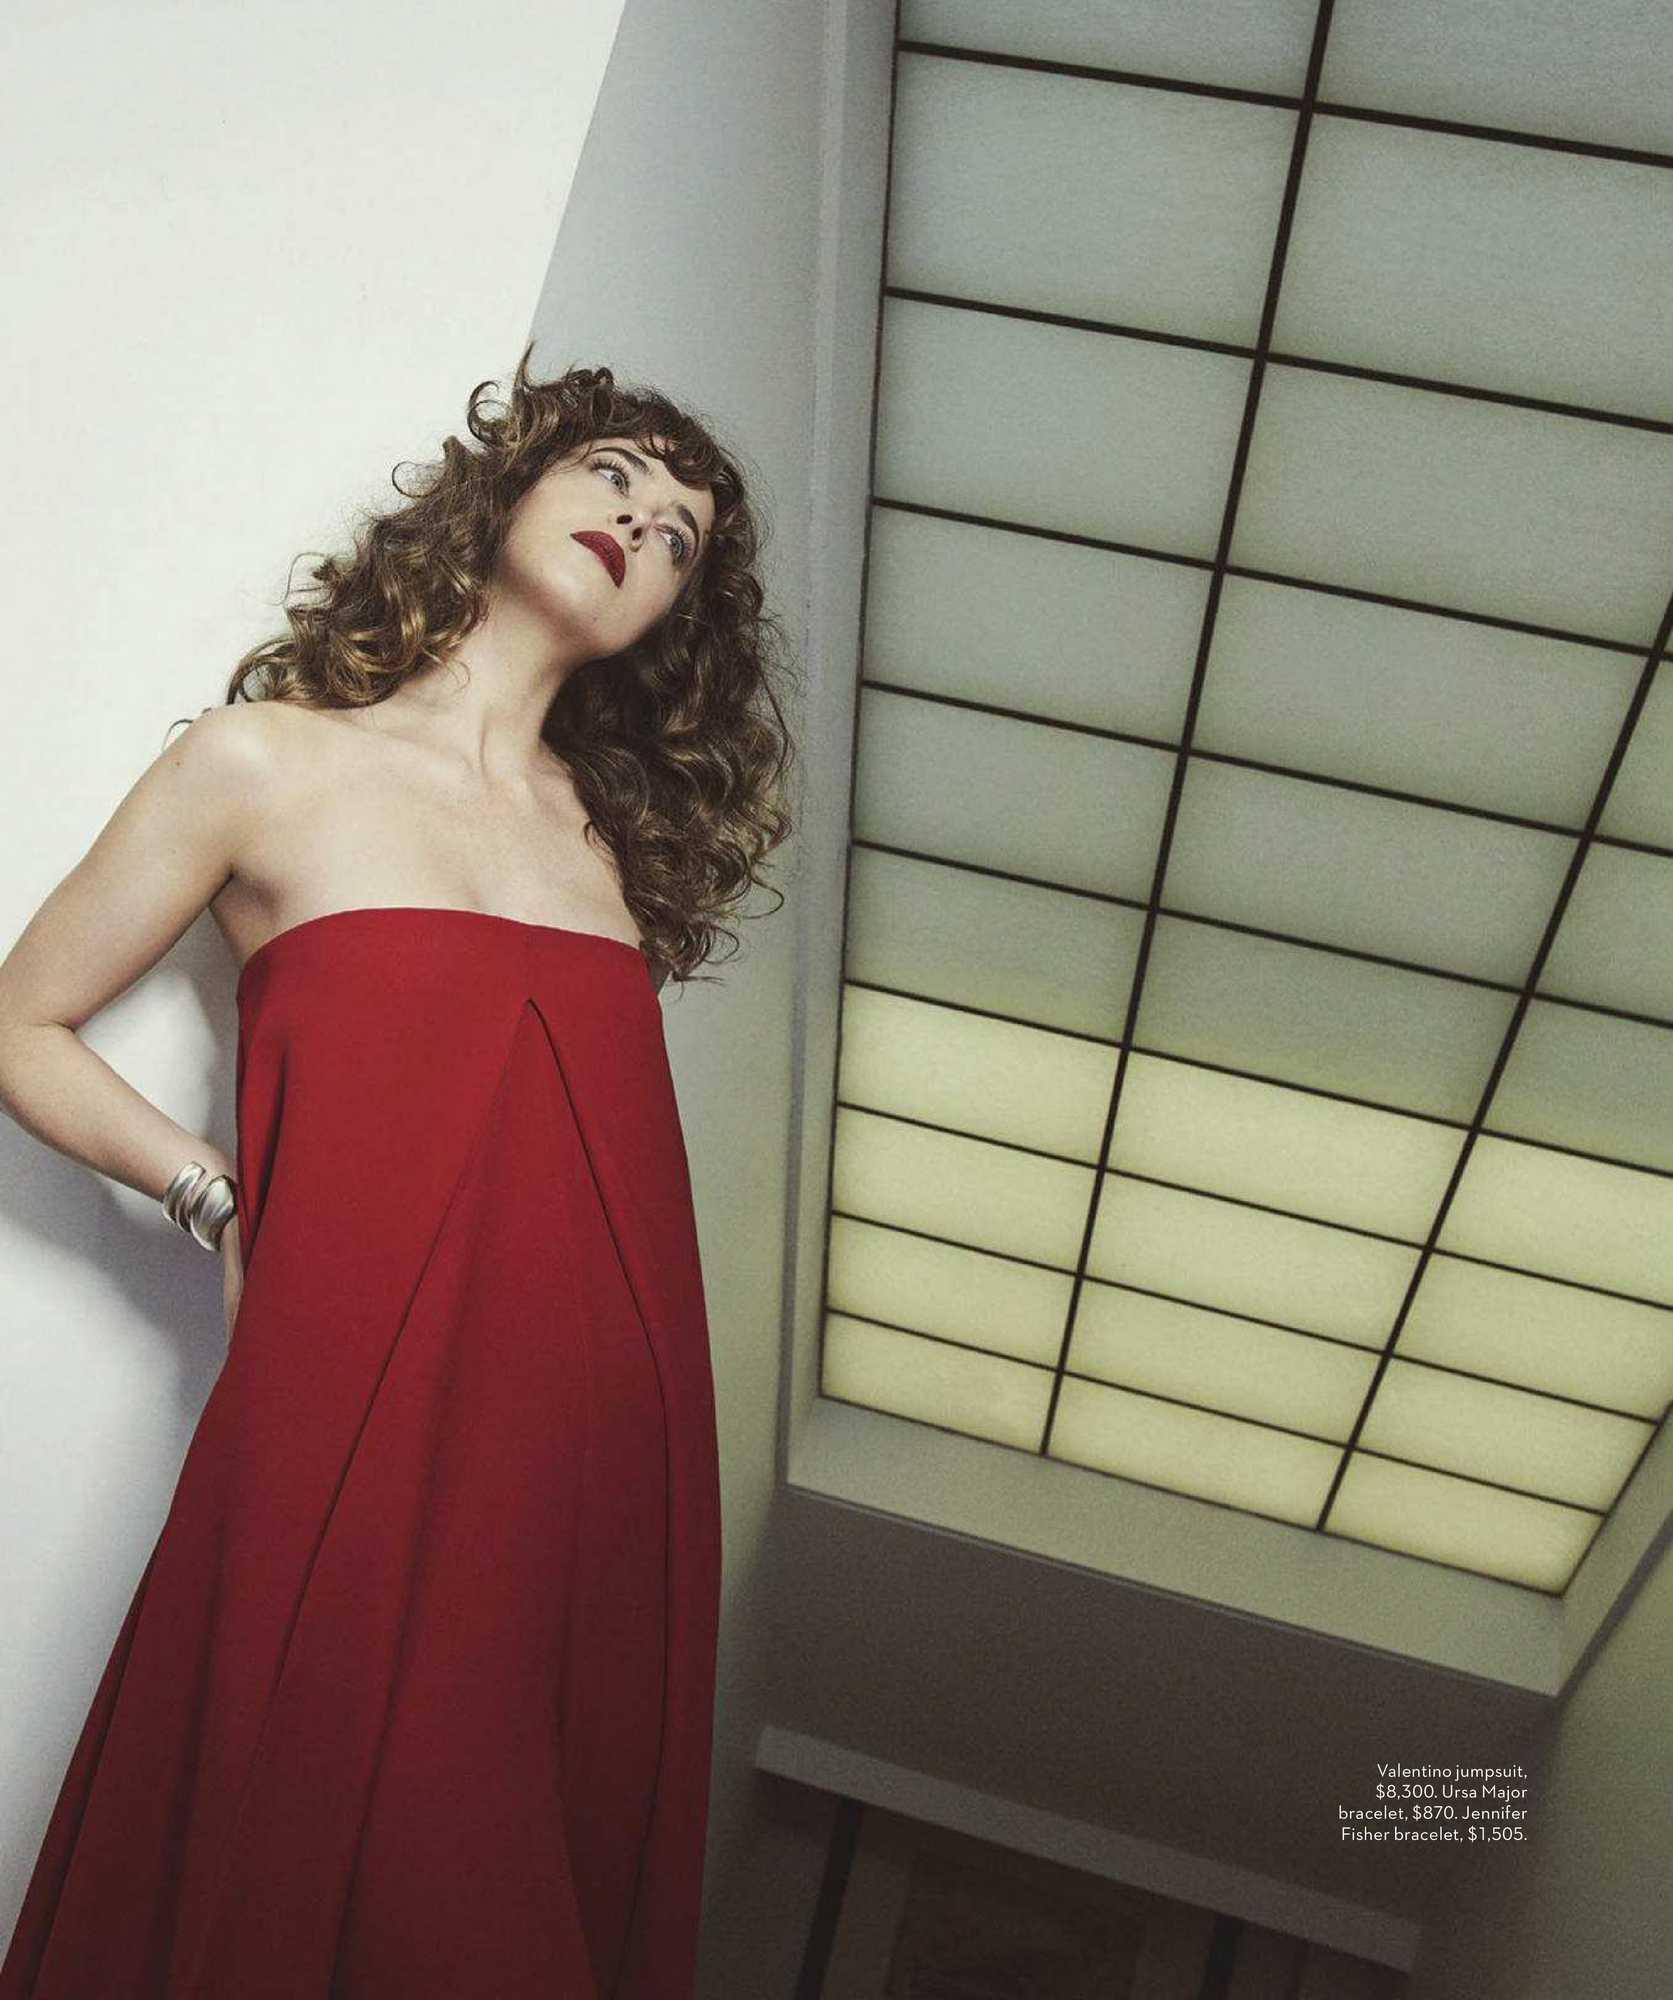 Dakota-Johnson-Emma-Summerton-Photoshoot-for-Vogue-Australia-October-2018e5b36e982742134.jpg